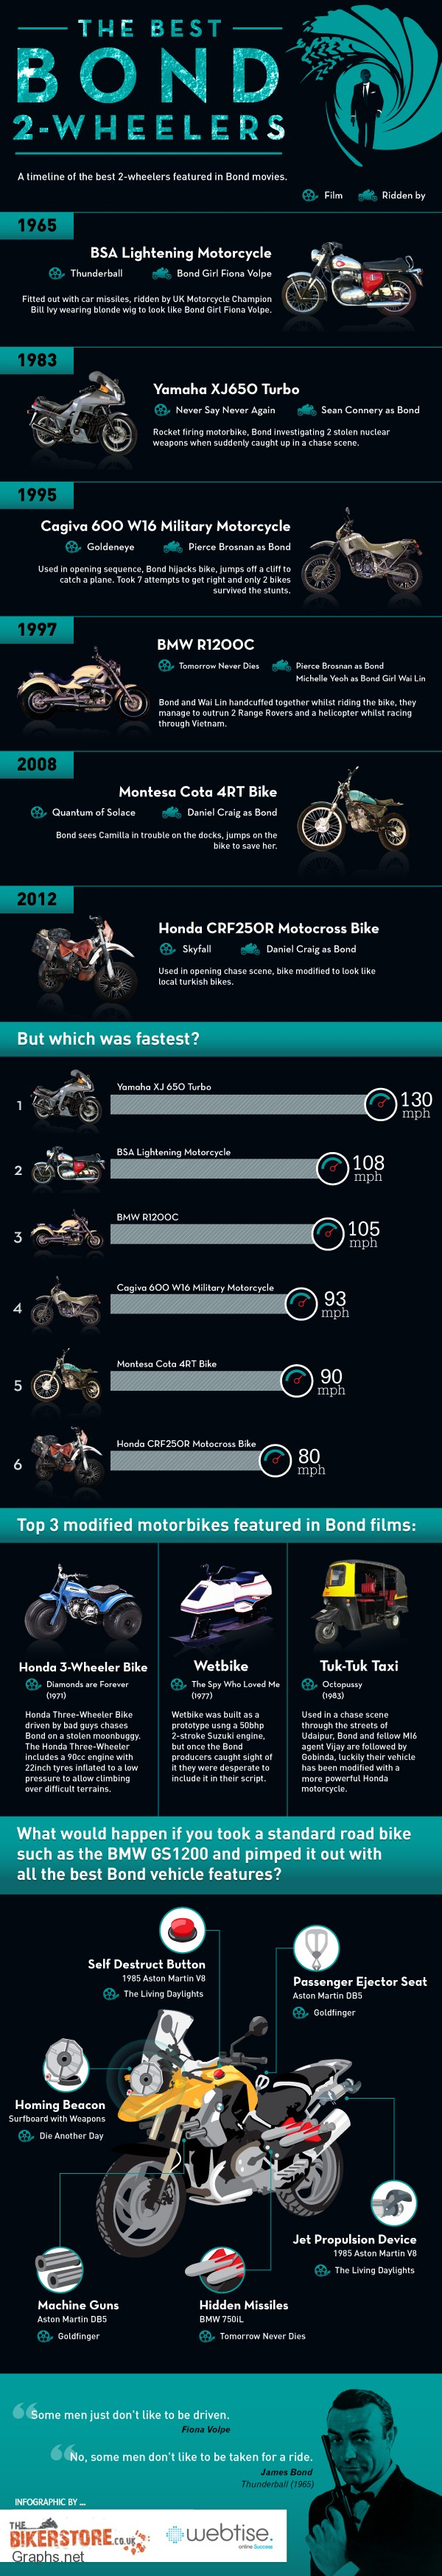 The Best Bond Bikes